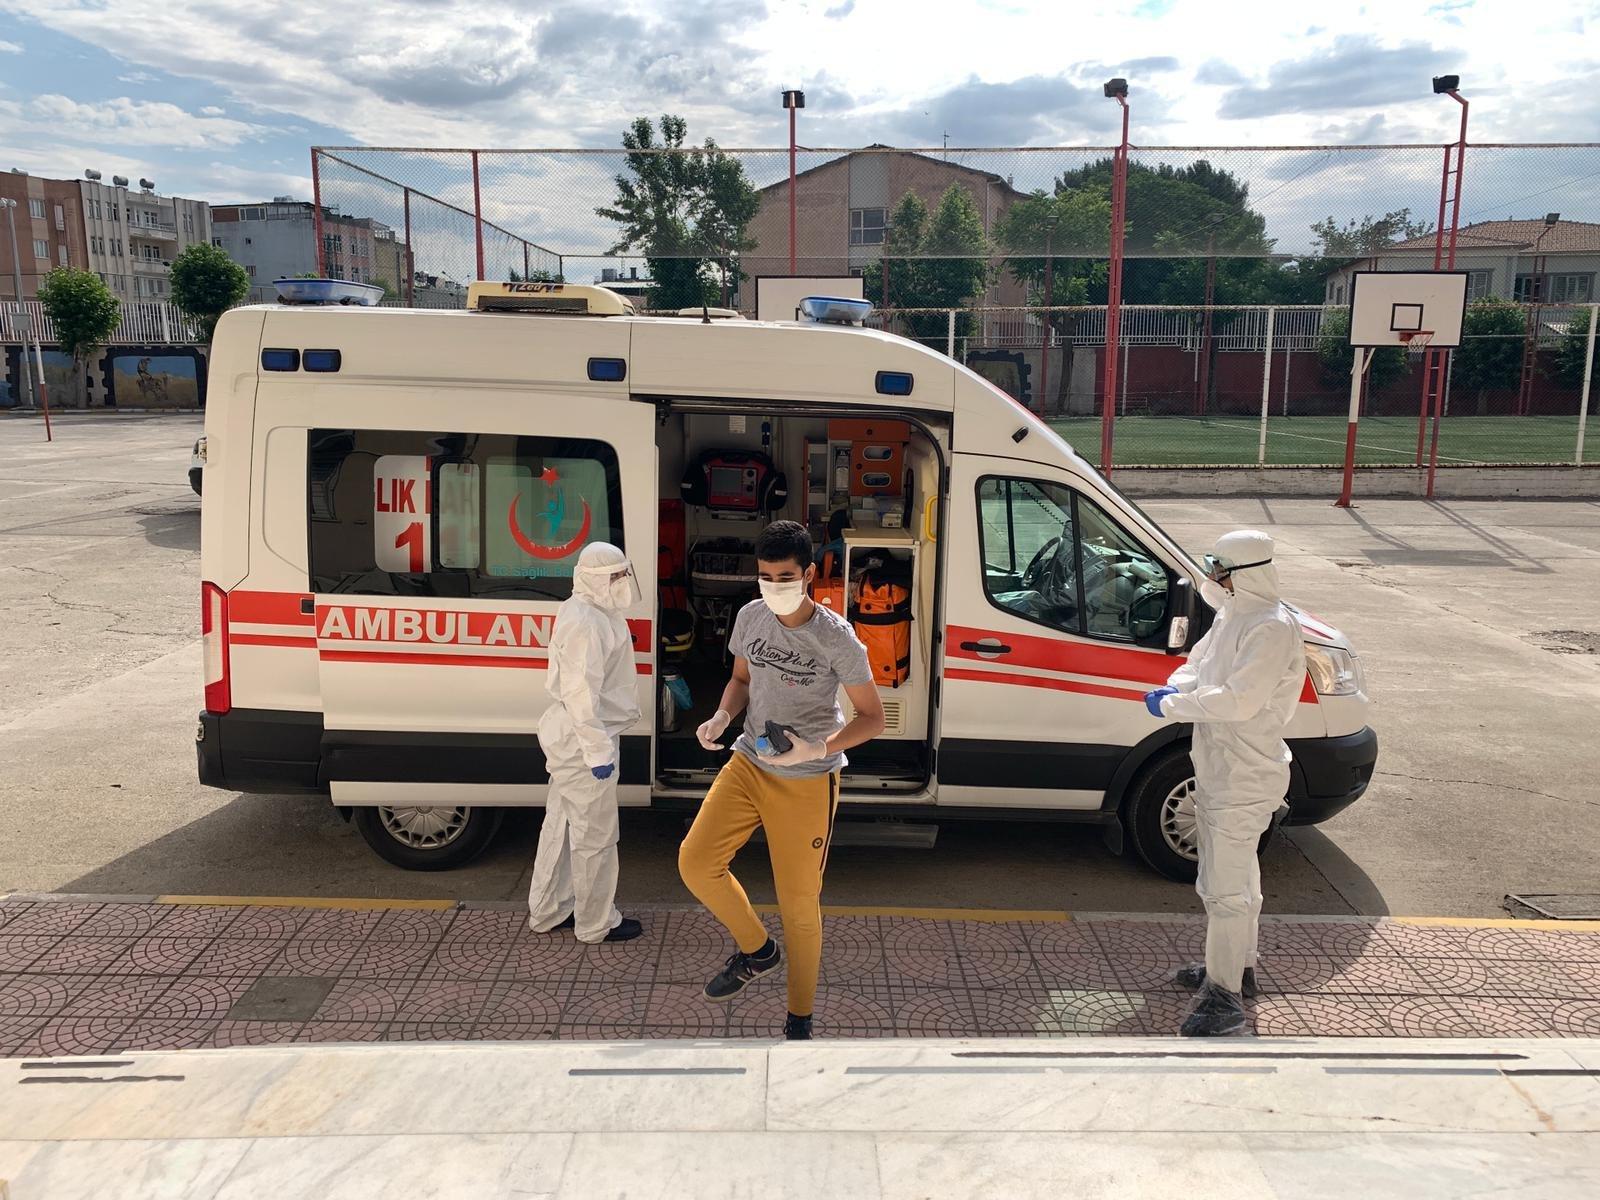 2.5M students take university entrance exam amid COVID-19 outbreak thumbnail